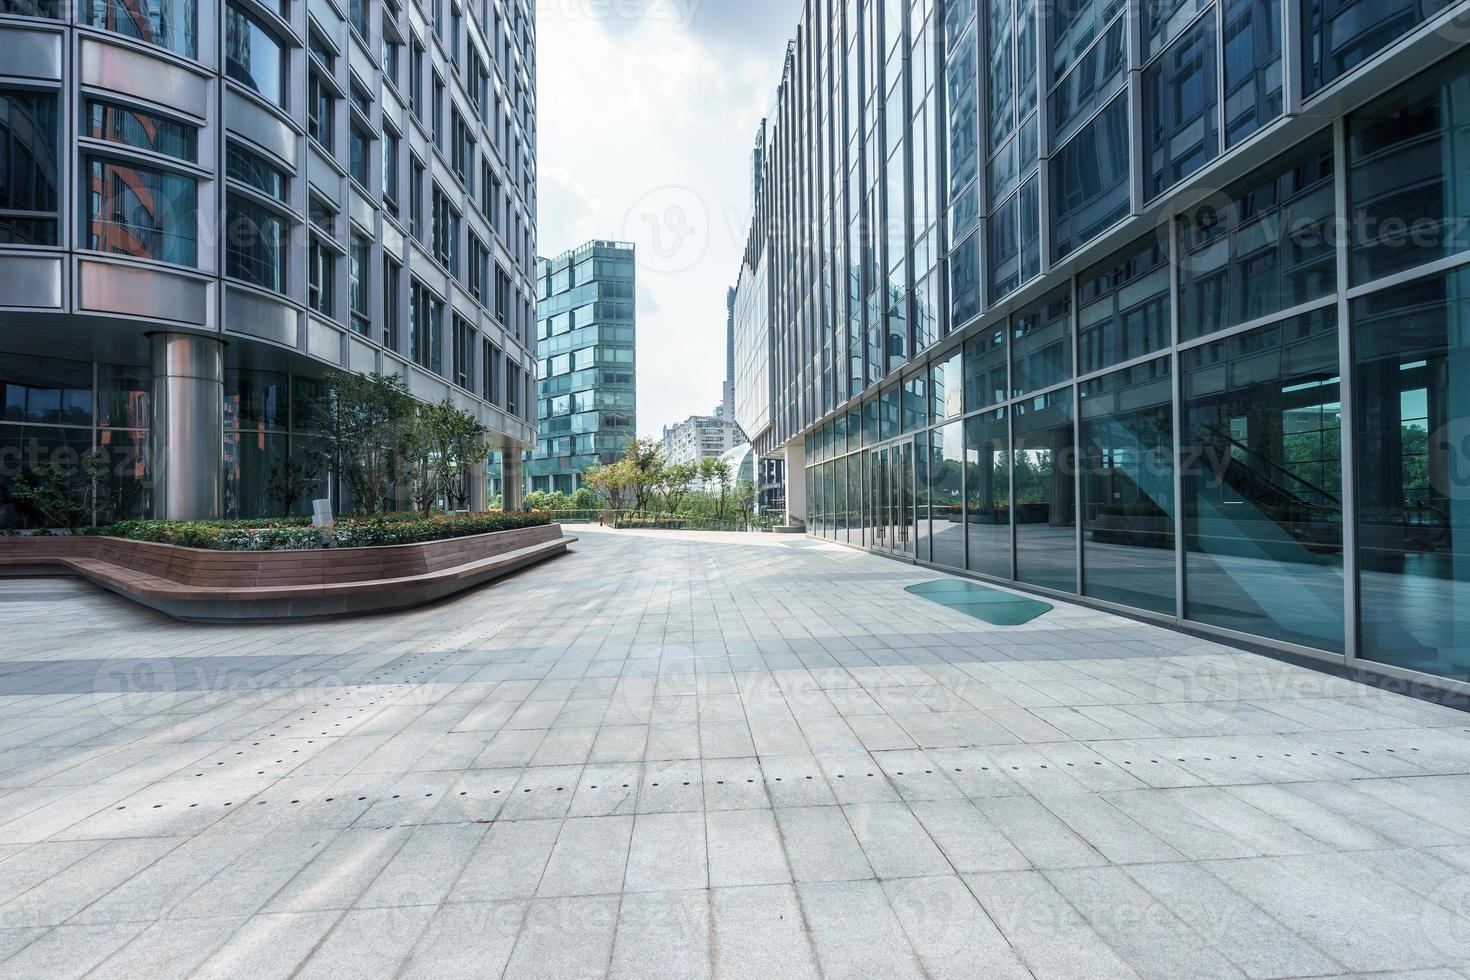 lege begane grond van moderne gebouwen foto